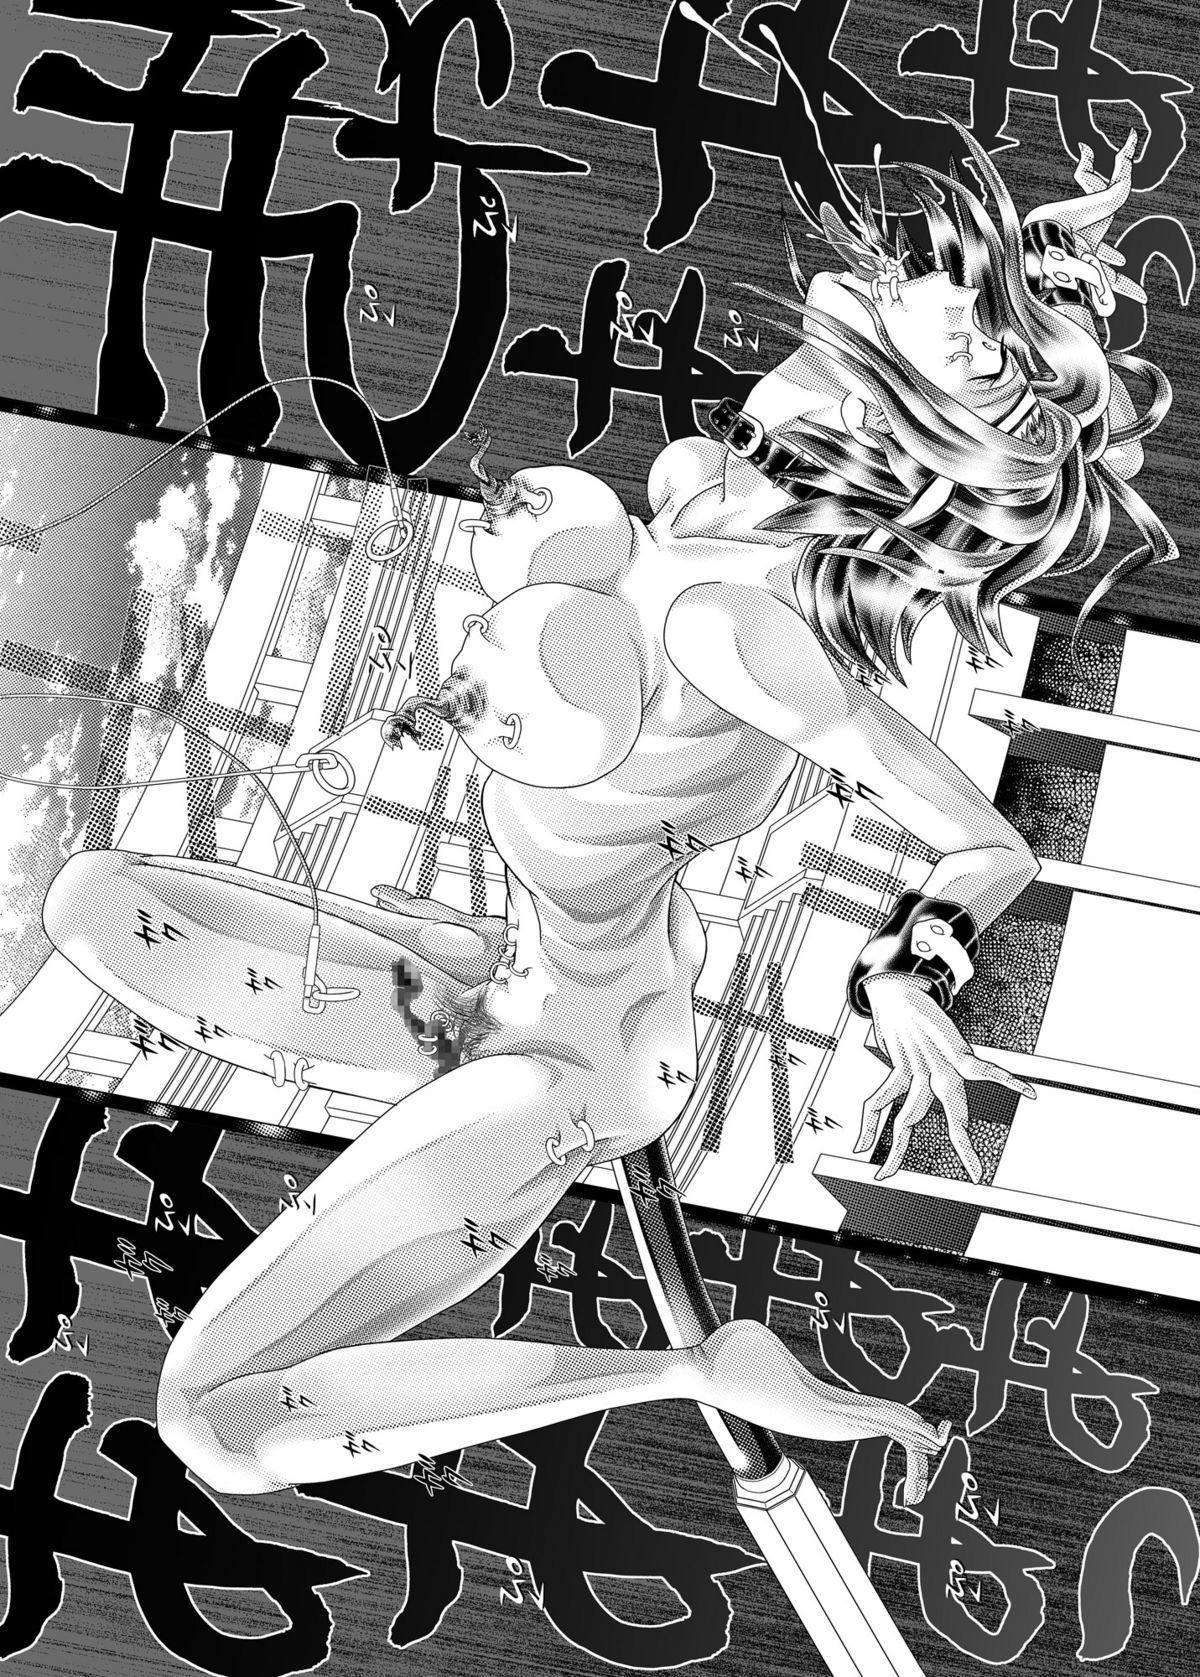 [Kaki no Boo (Kakinomoto Utamaro)] Karen - R22 of the Cord Eros - Infringement (Code Geass) [Digital] 18